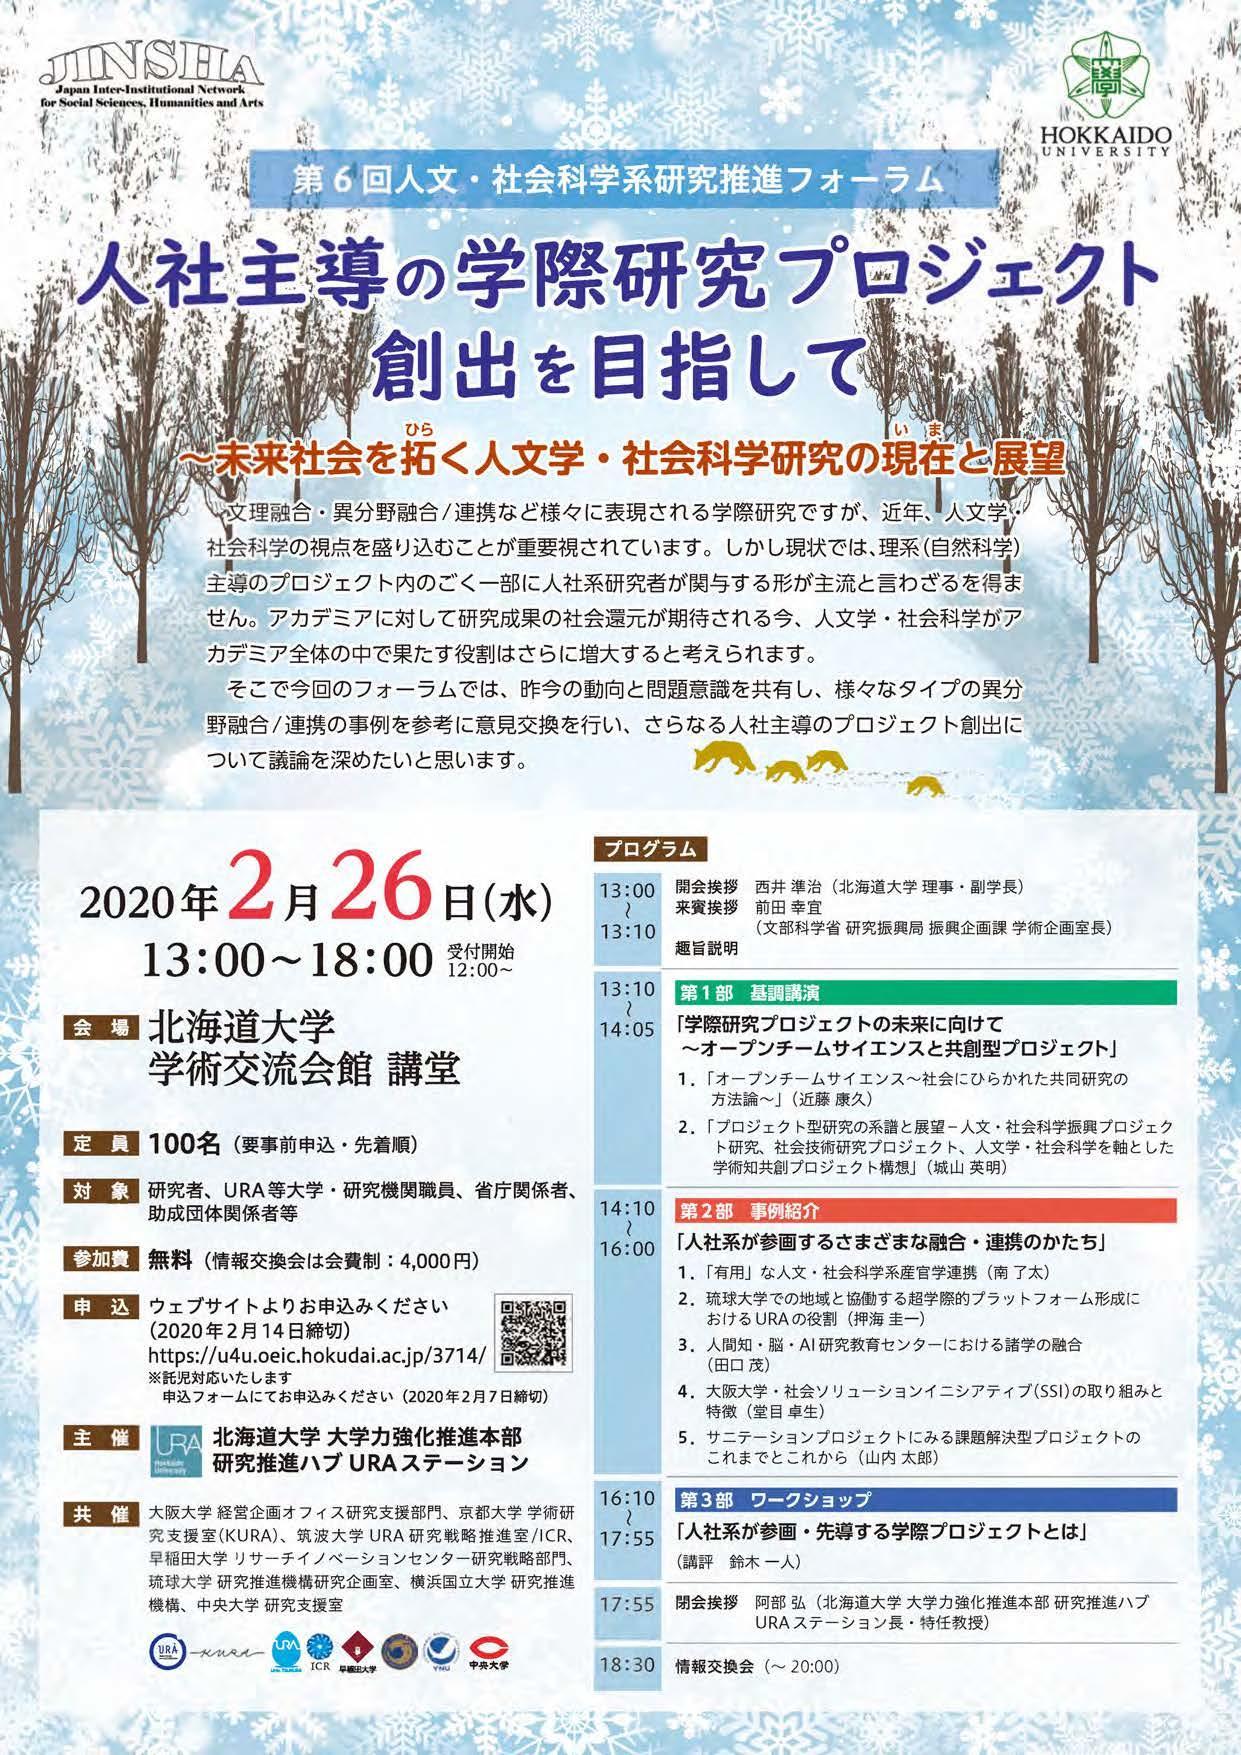 leaflet_web_p1.jpg